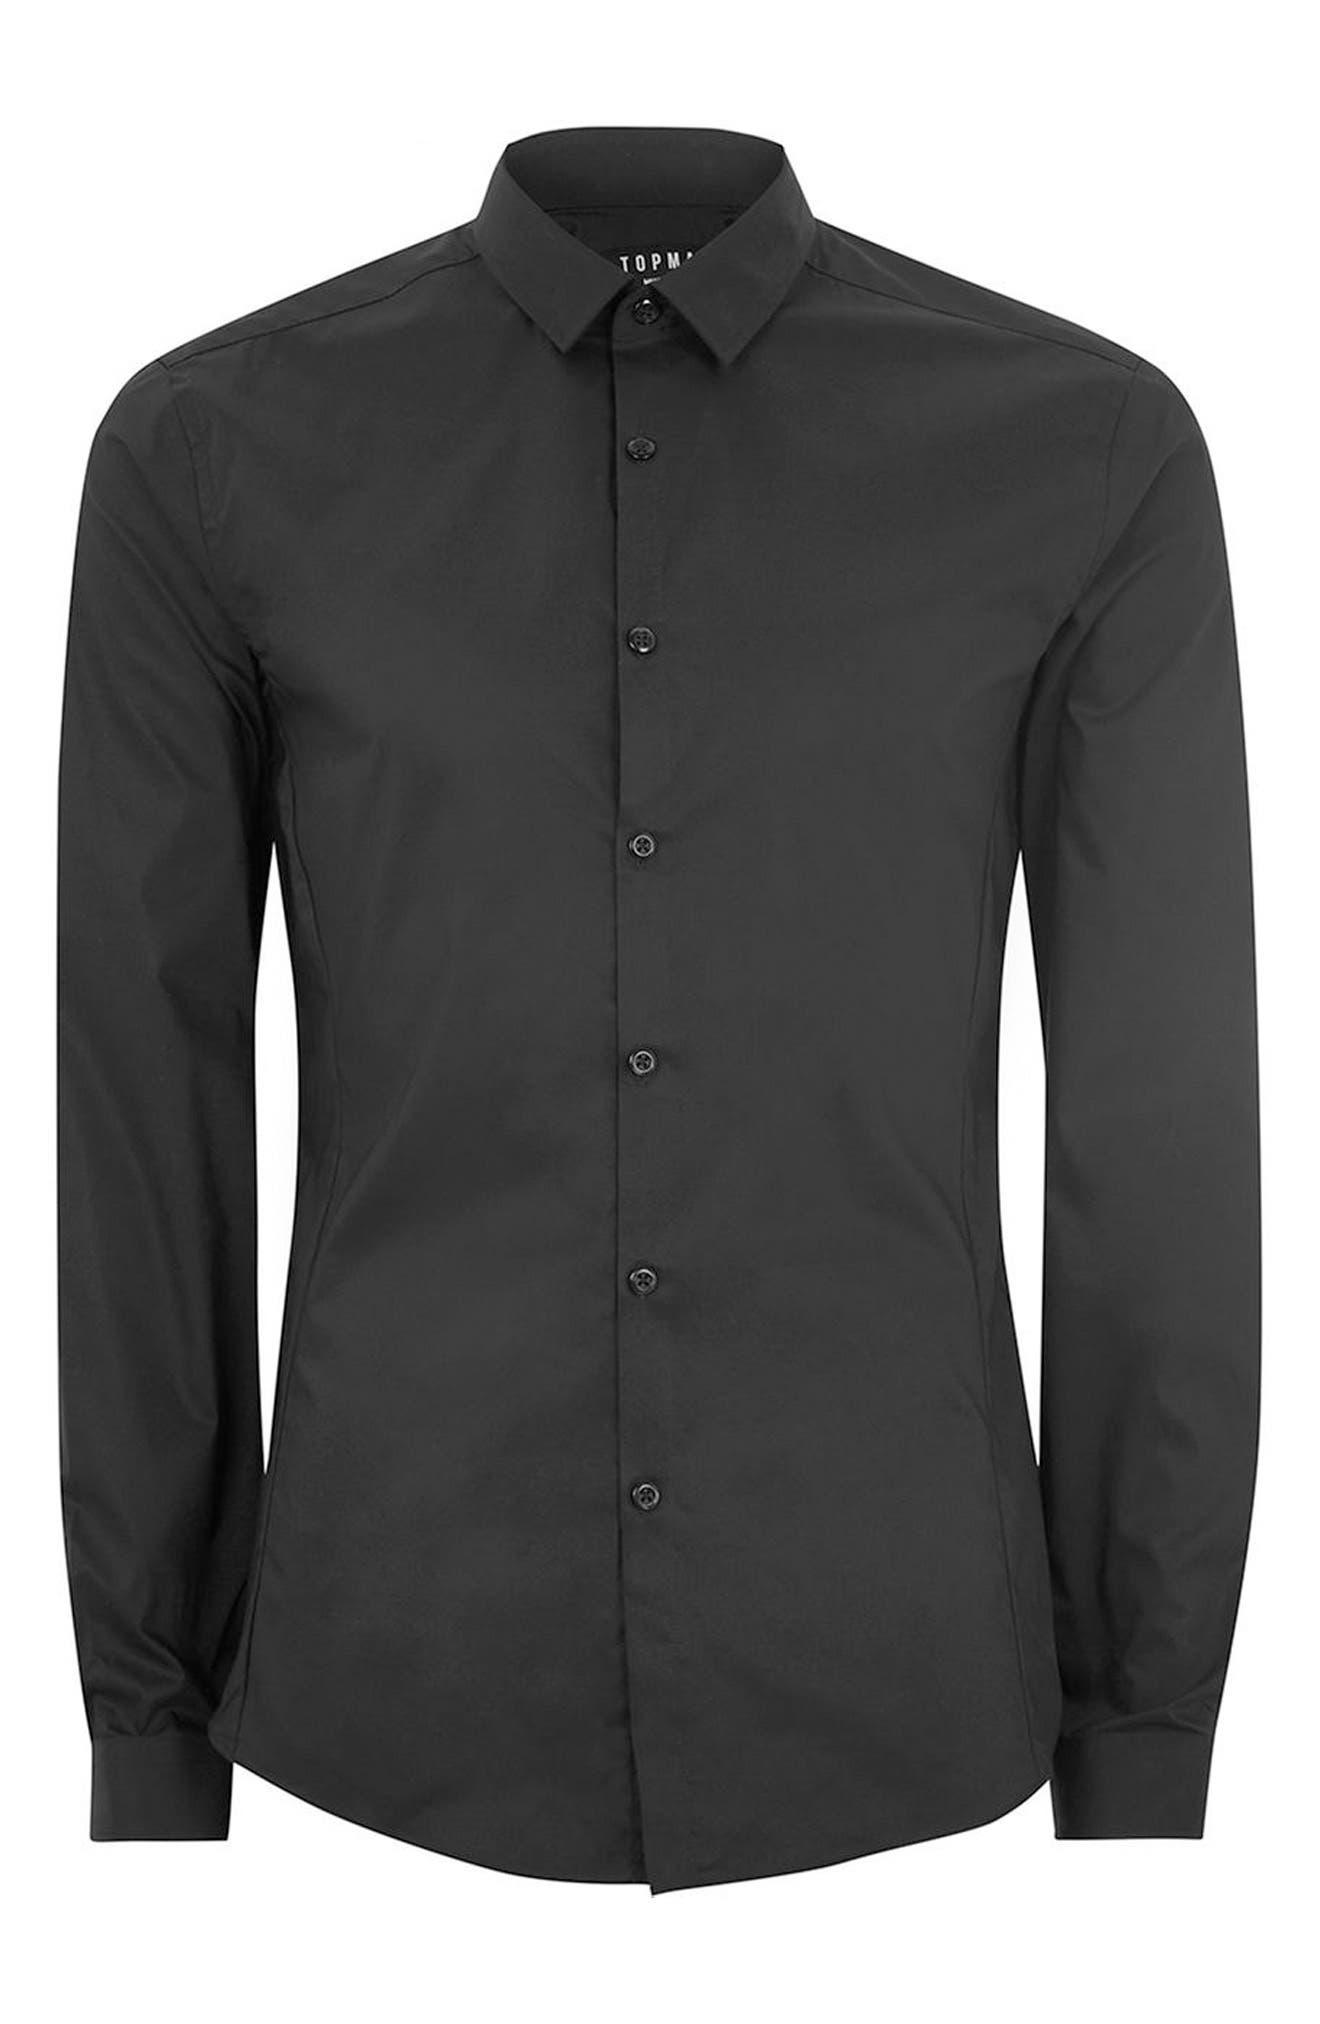 TOPMAN, Muscle Fit Stretch Poplin Shirt, Alternate thumbnail 4, color, BLACK